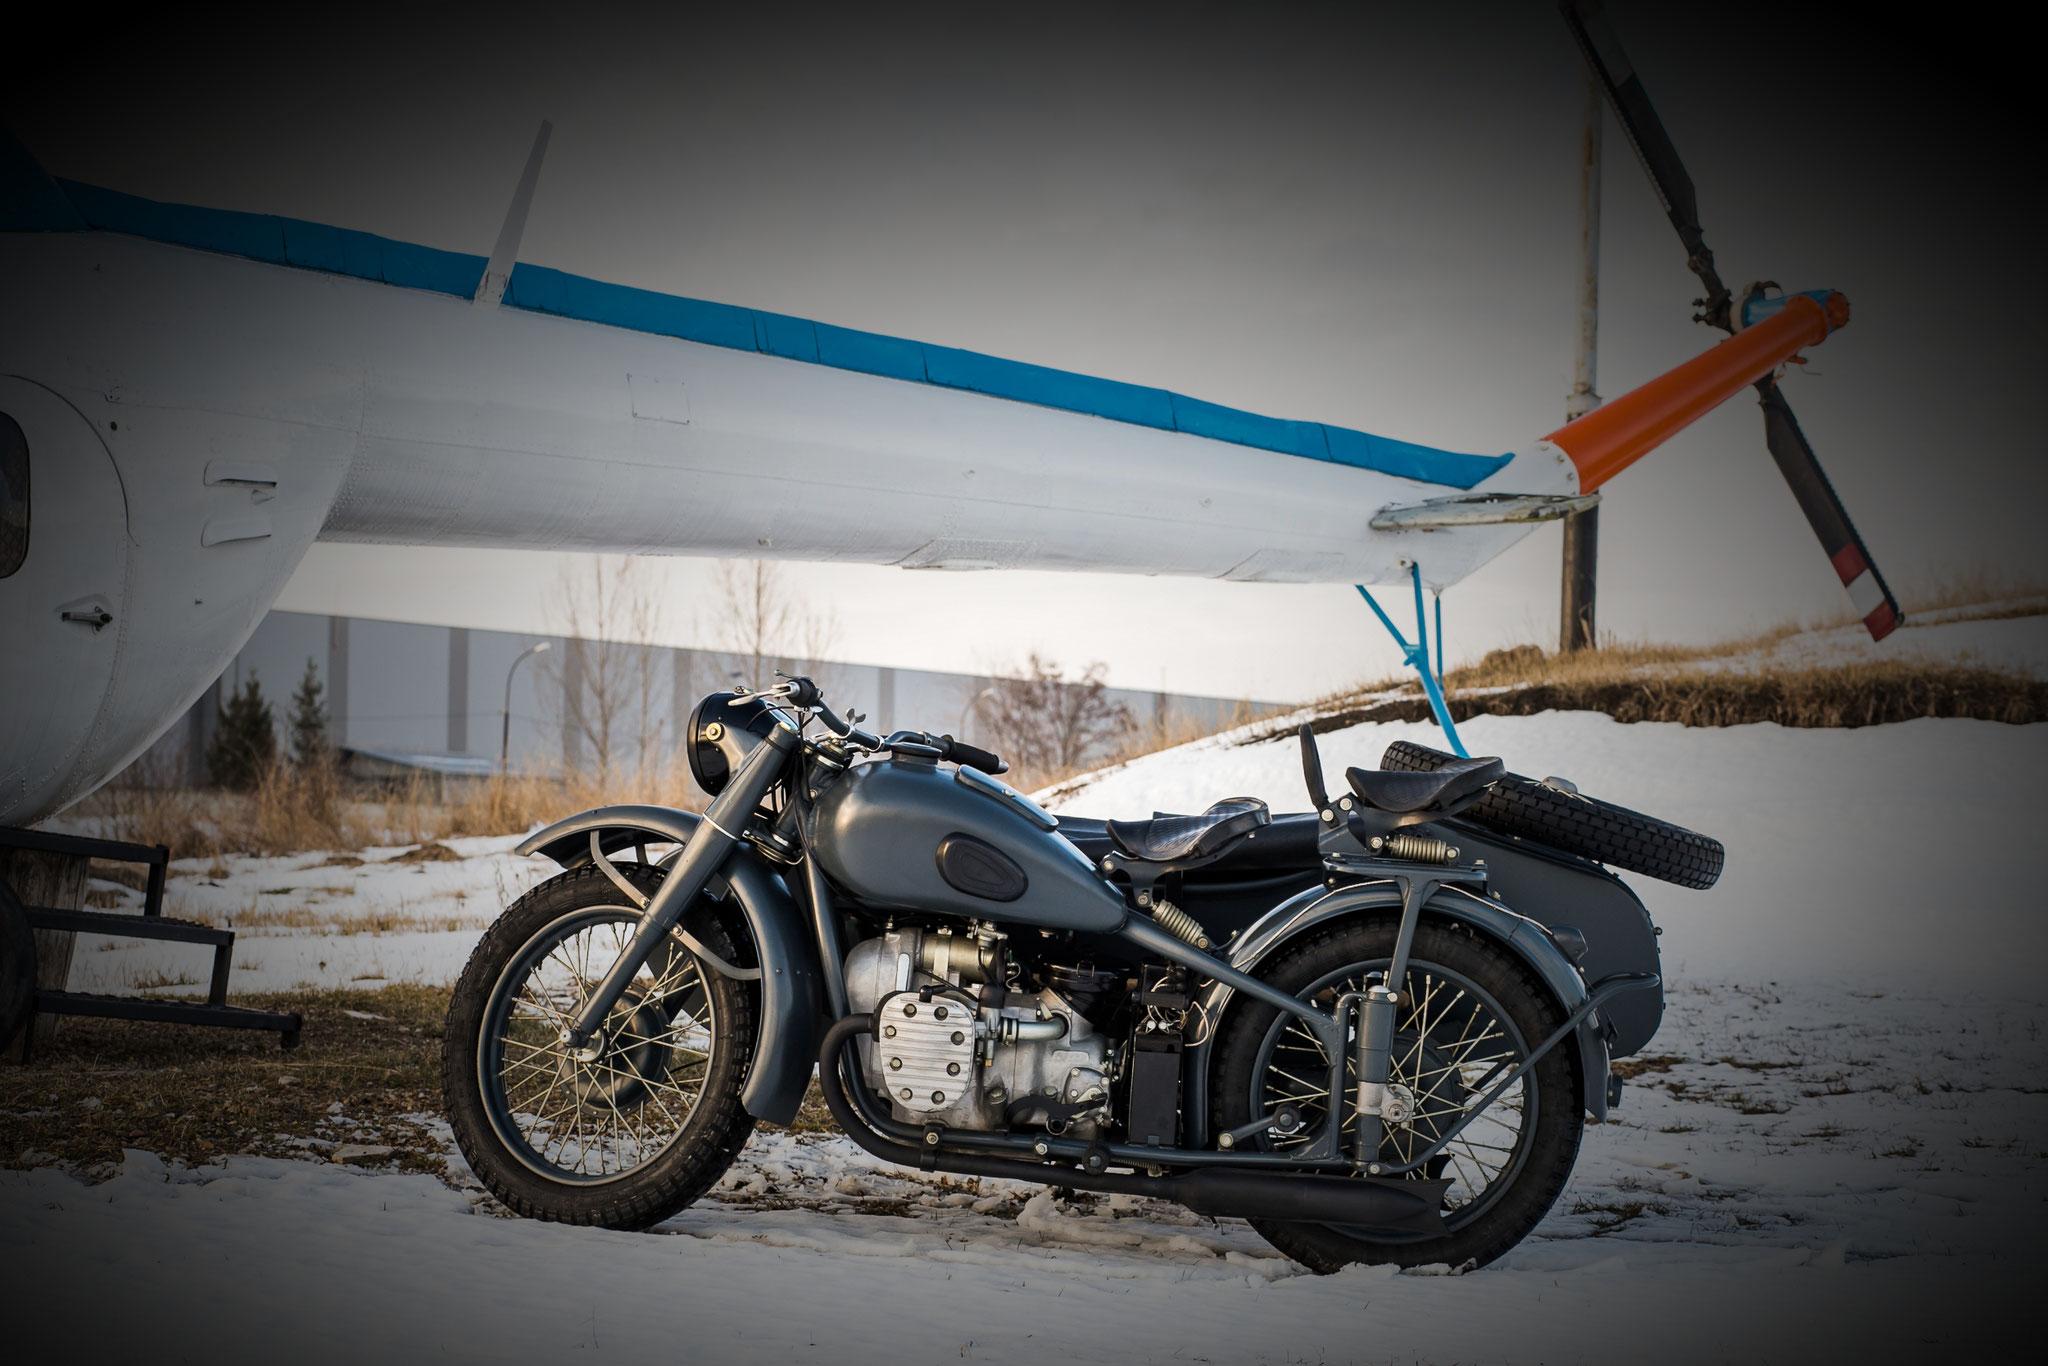 Pantser - (Dnepr K-750 - 1960) - from 6.000,00 euro